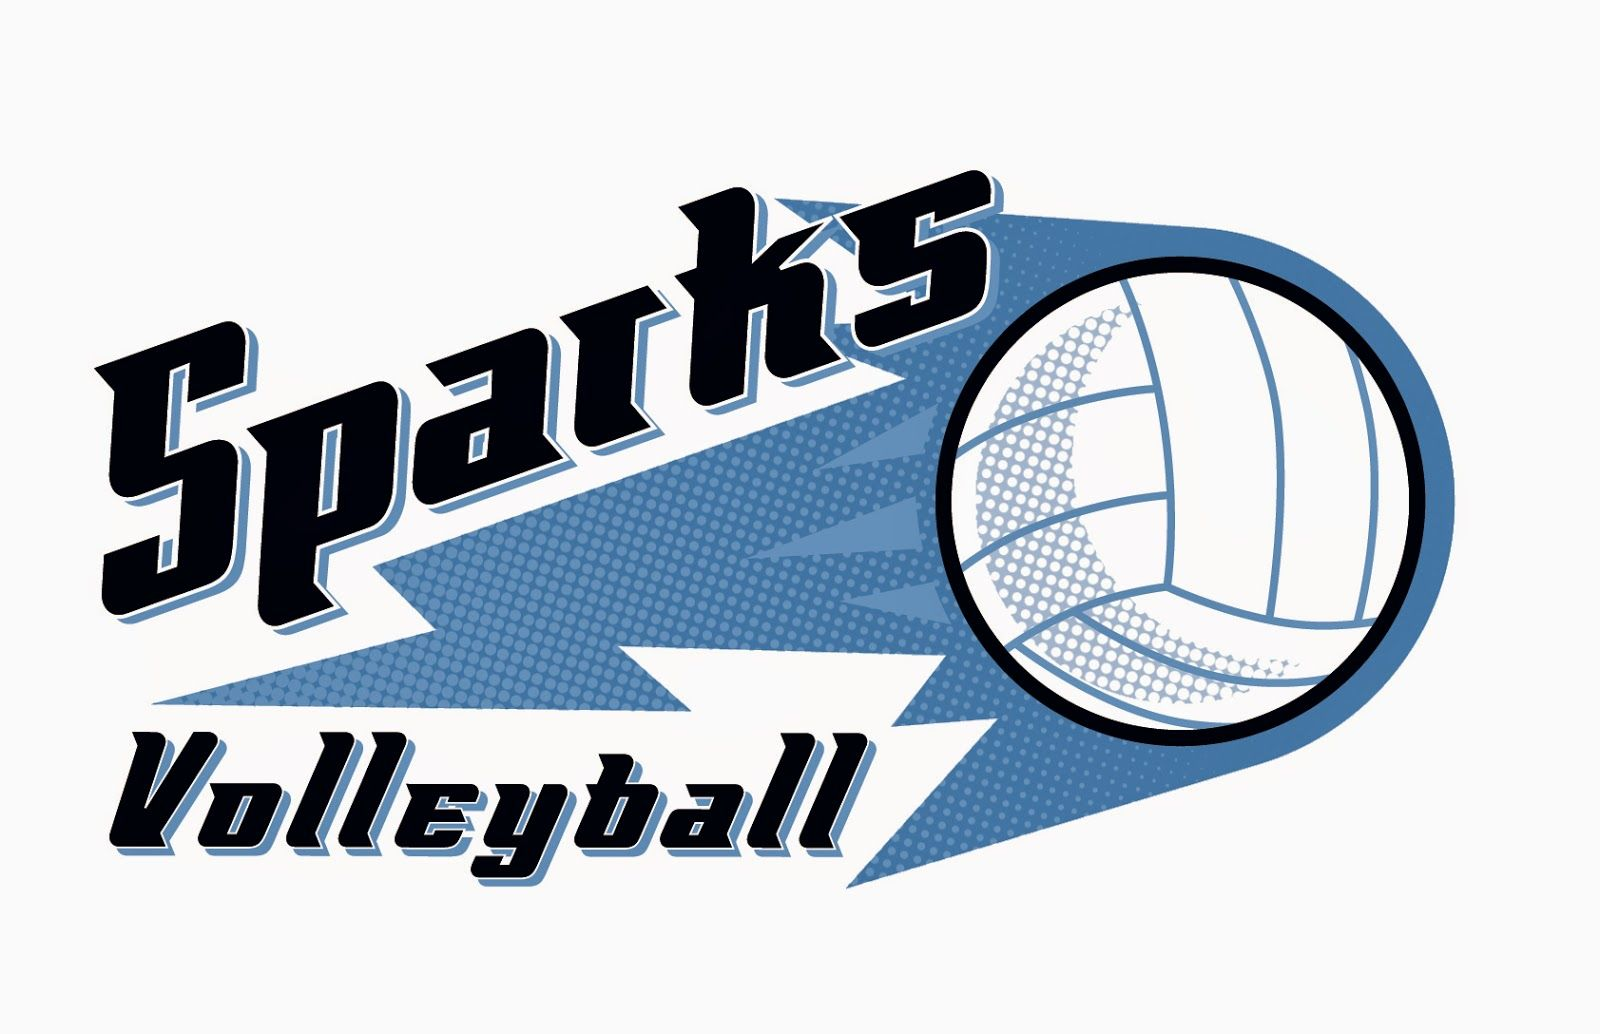 Sparks Volleyball Club Logo Design Volleyball Clubs Logo Design Logos